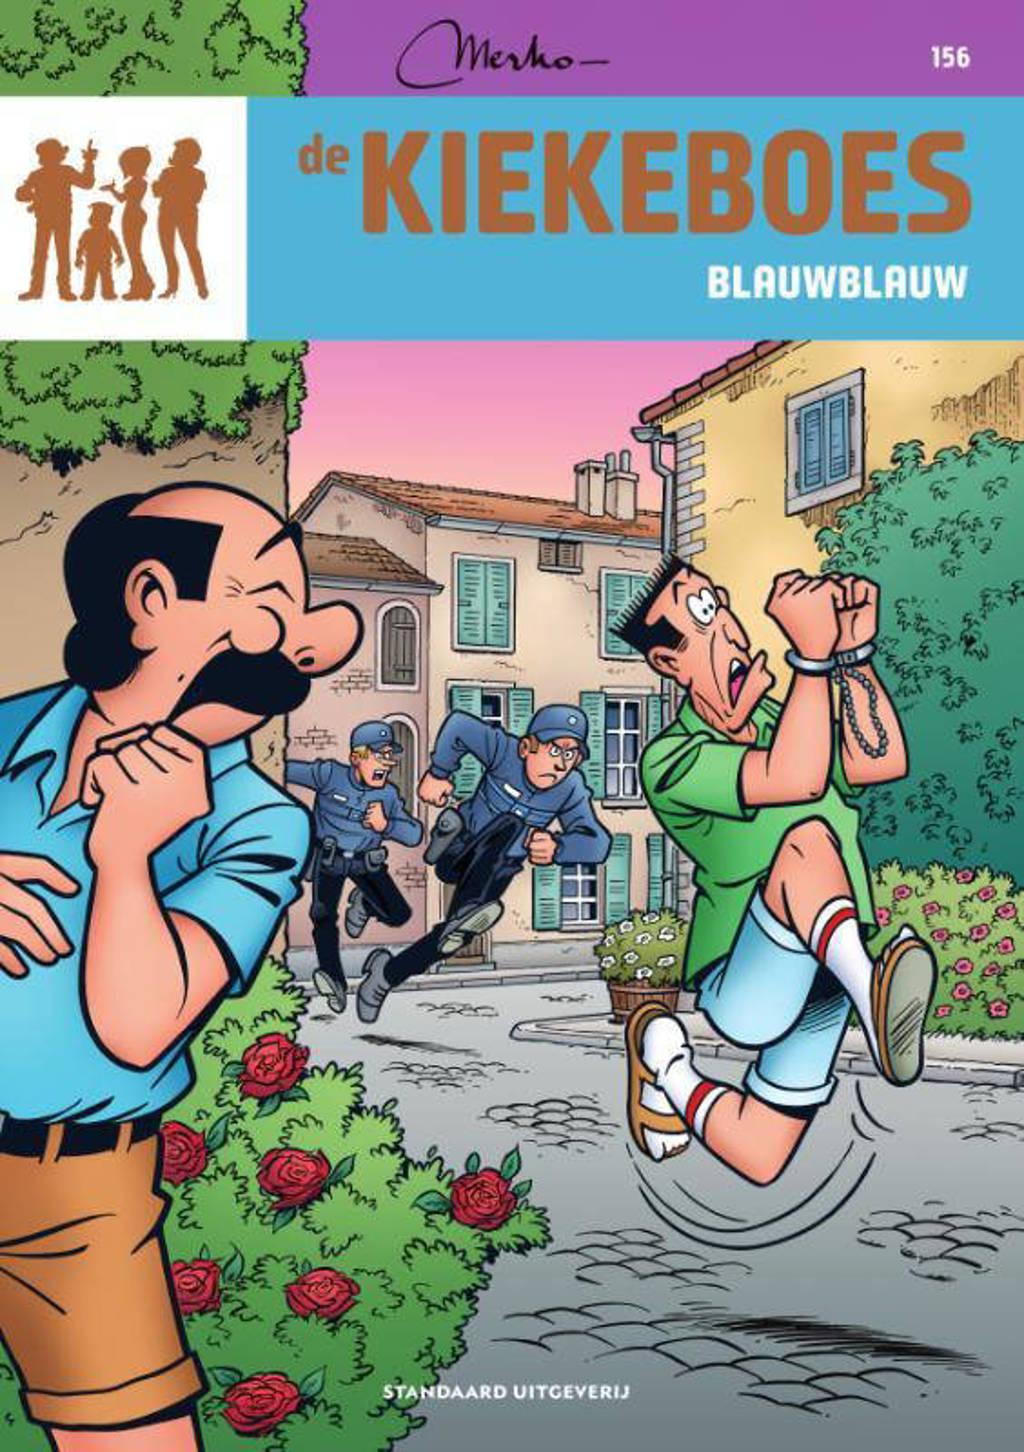 de Kiekeboes: Blauwblauw